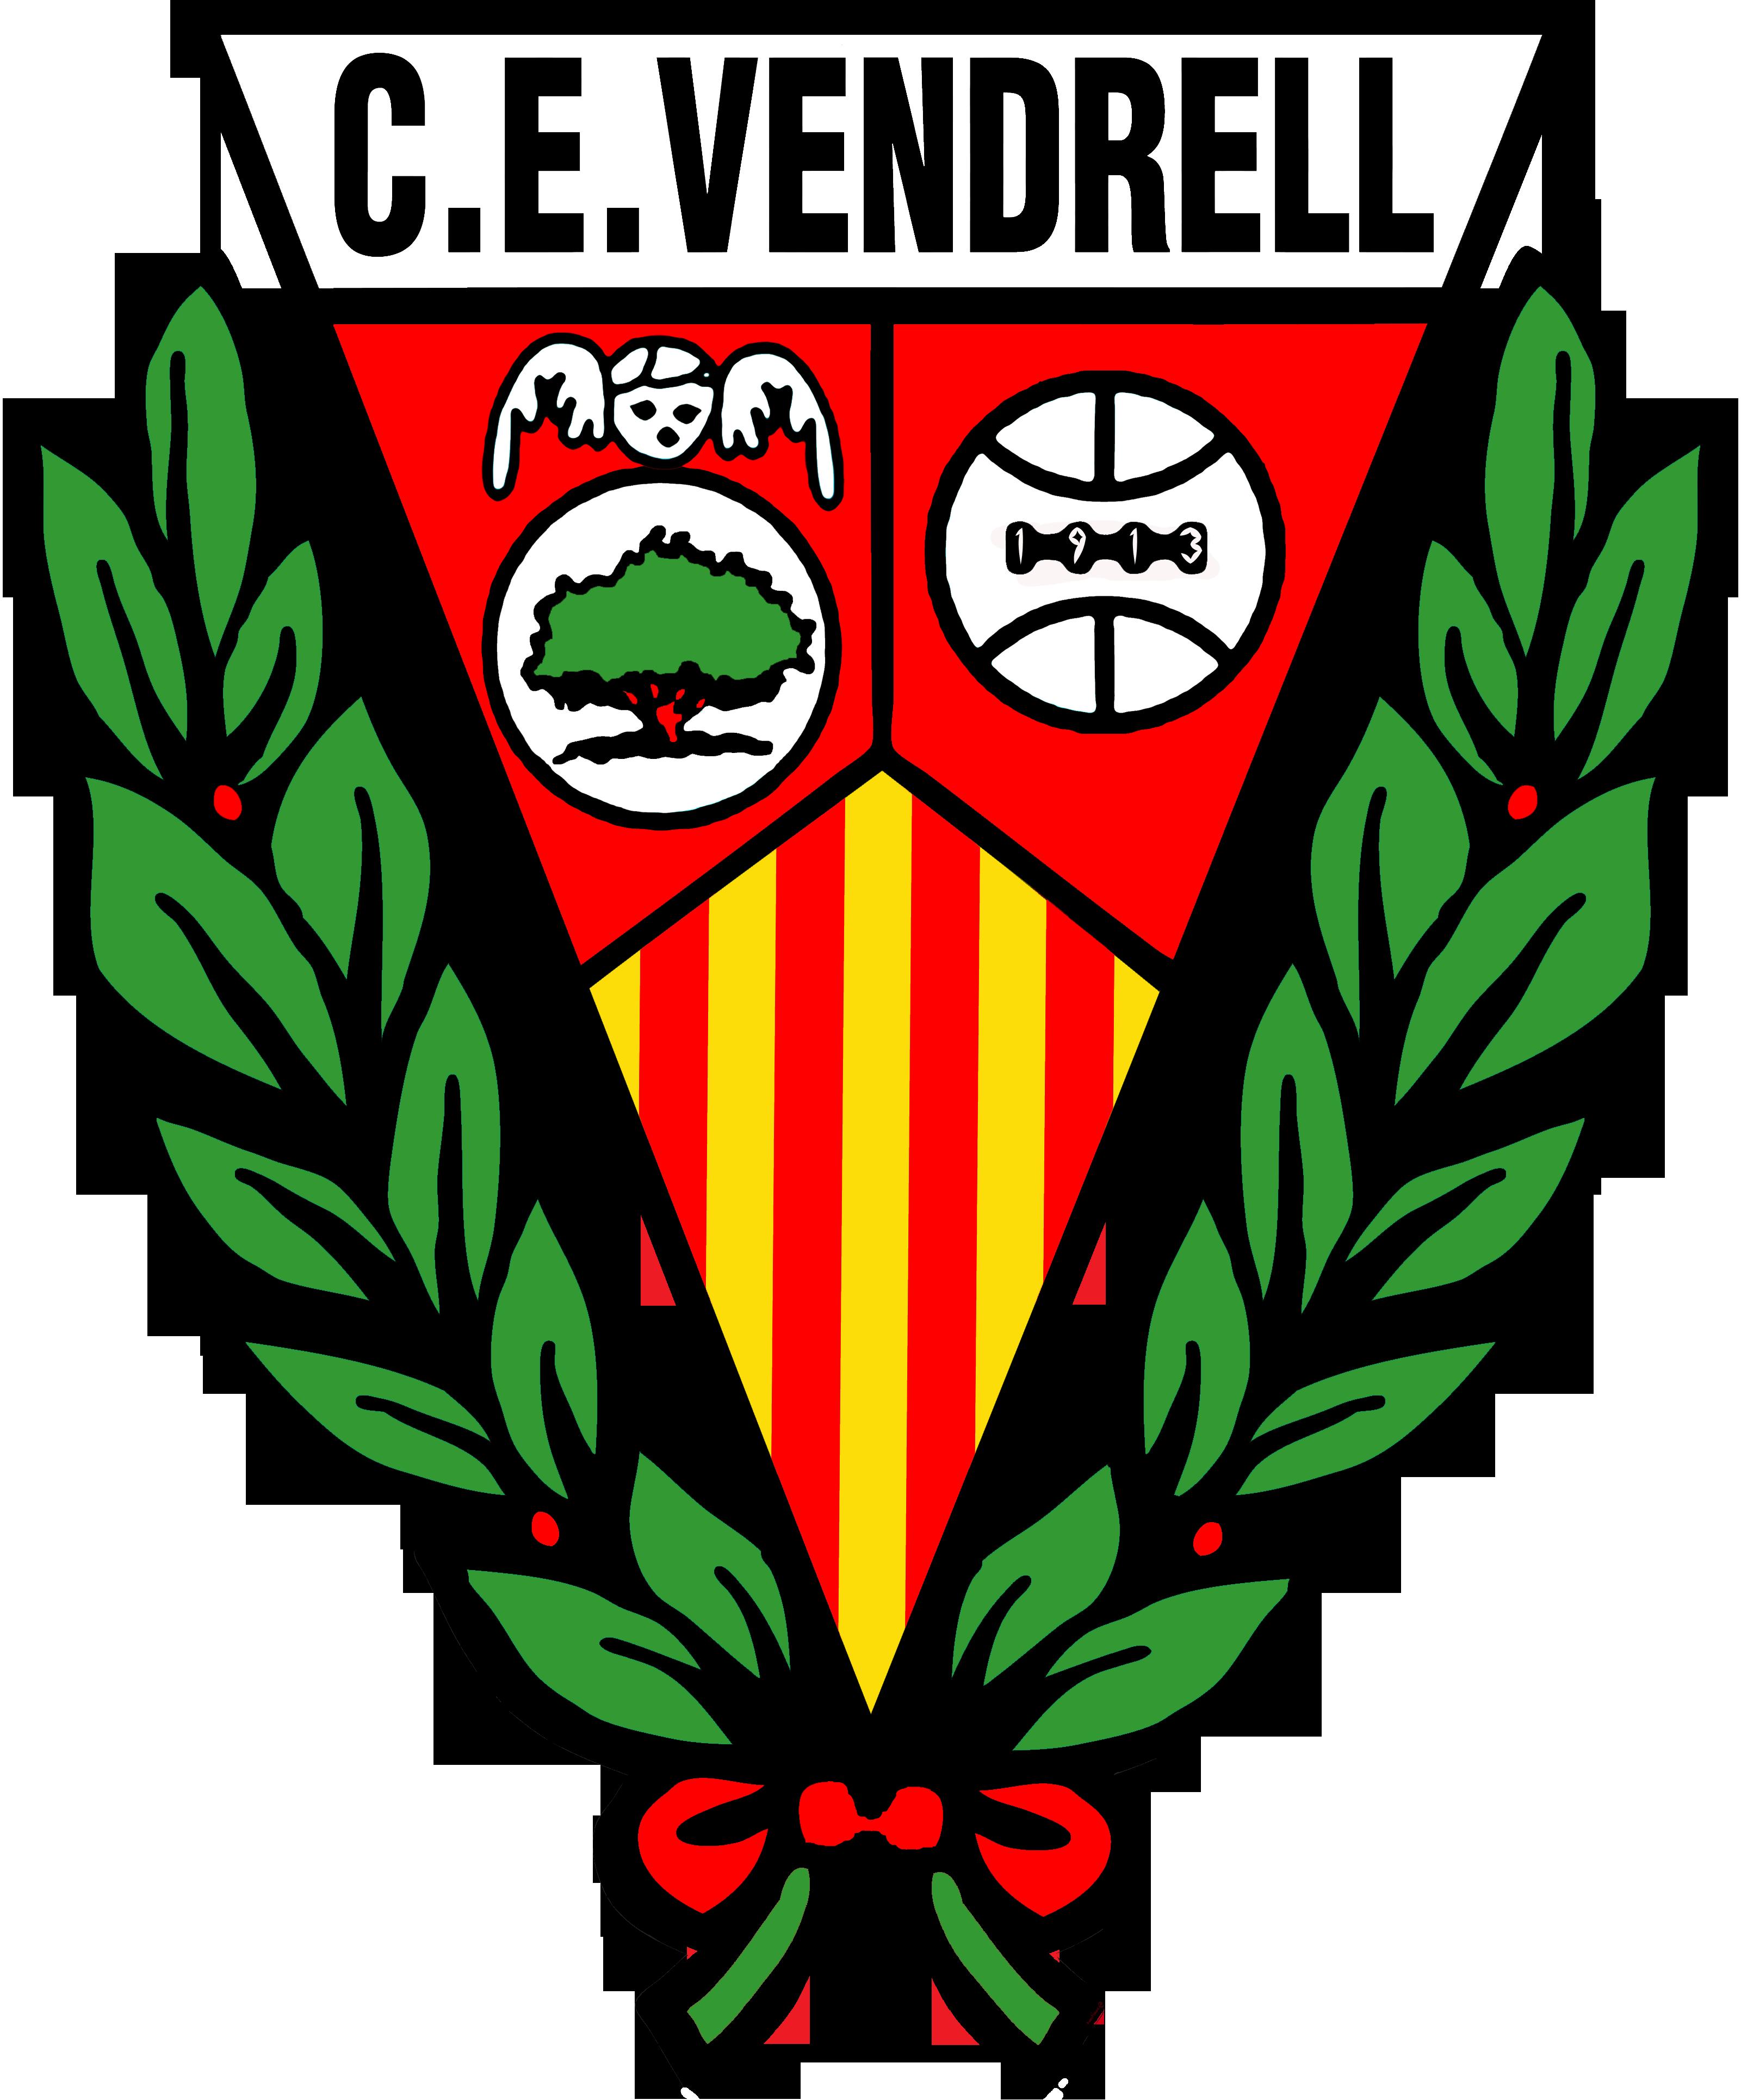 C.E. Vendrell Benjami B